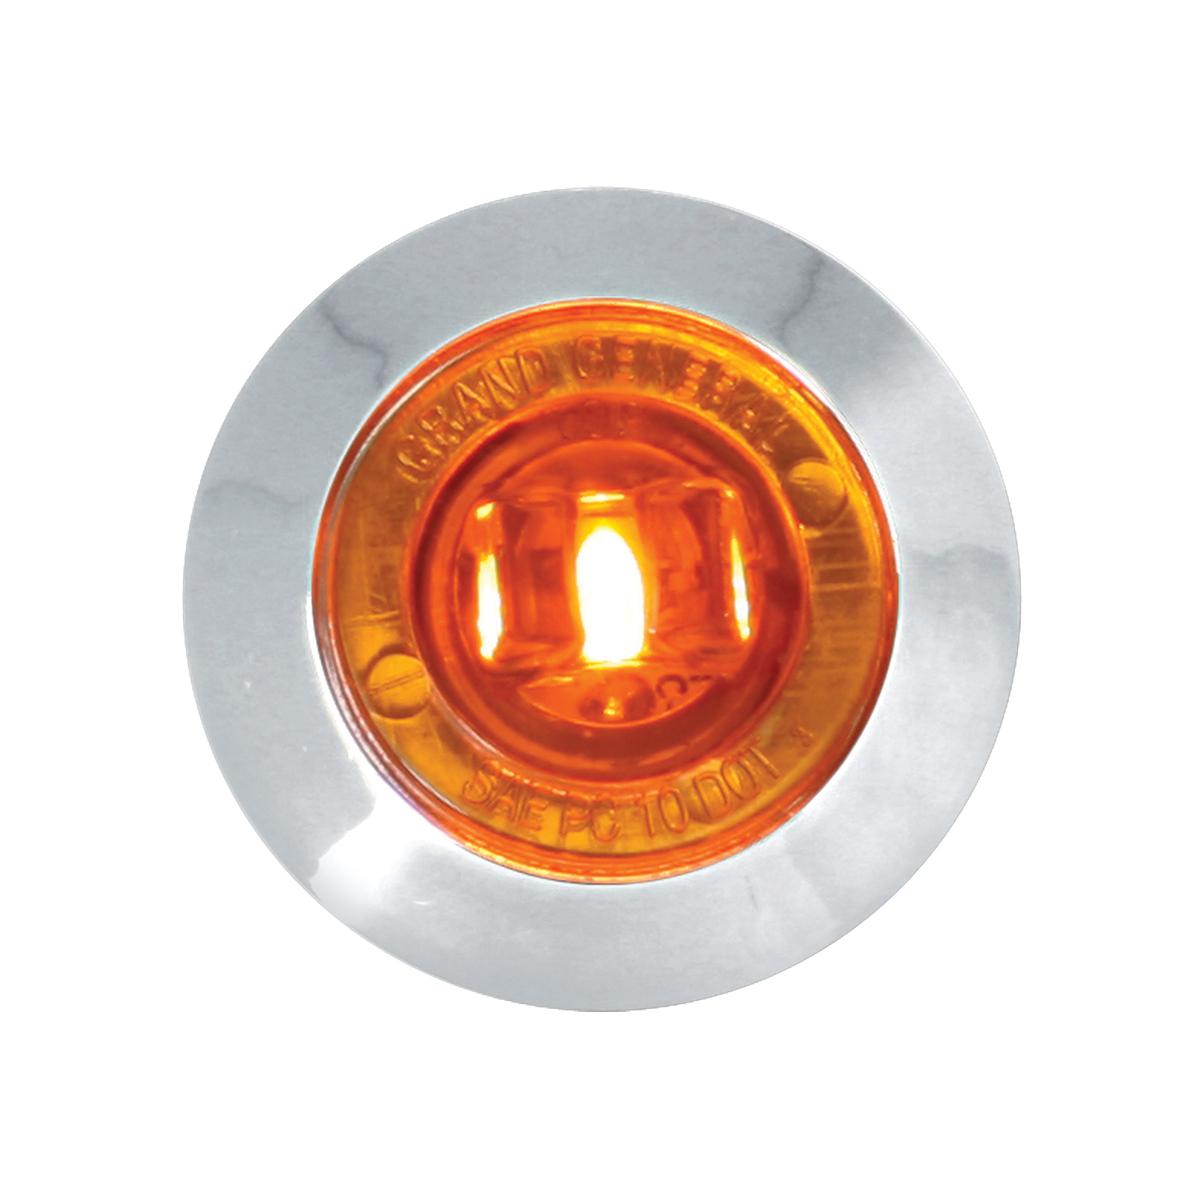 "75270 1"" Dual Function Mini Push/Screw-in Wide Angle LED Light w/ Chrome Bezel"